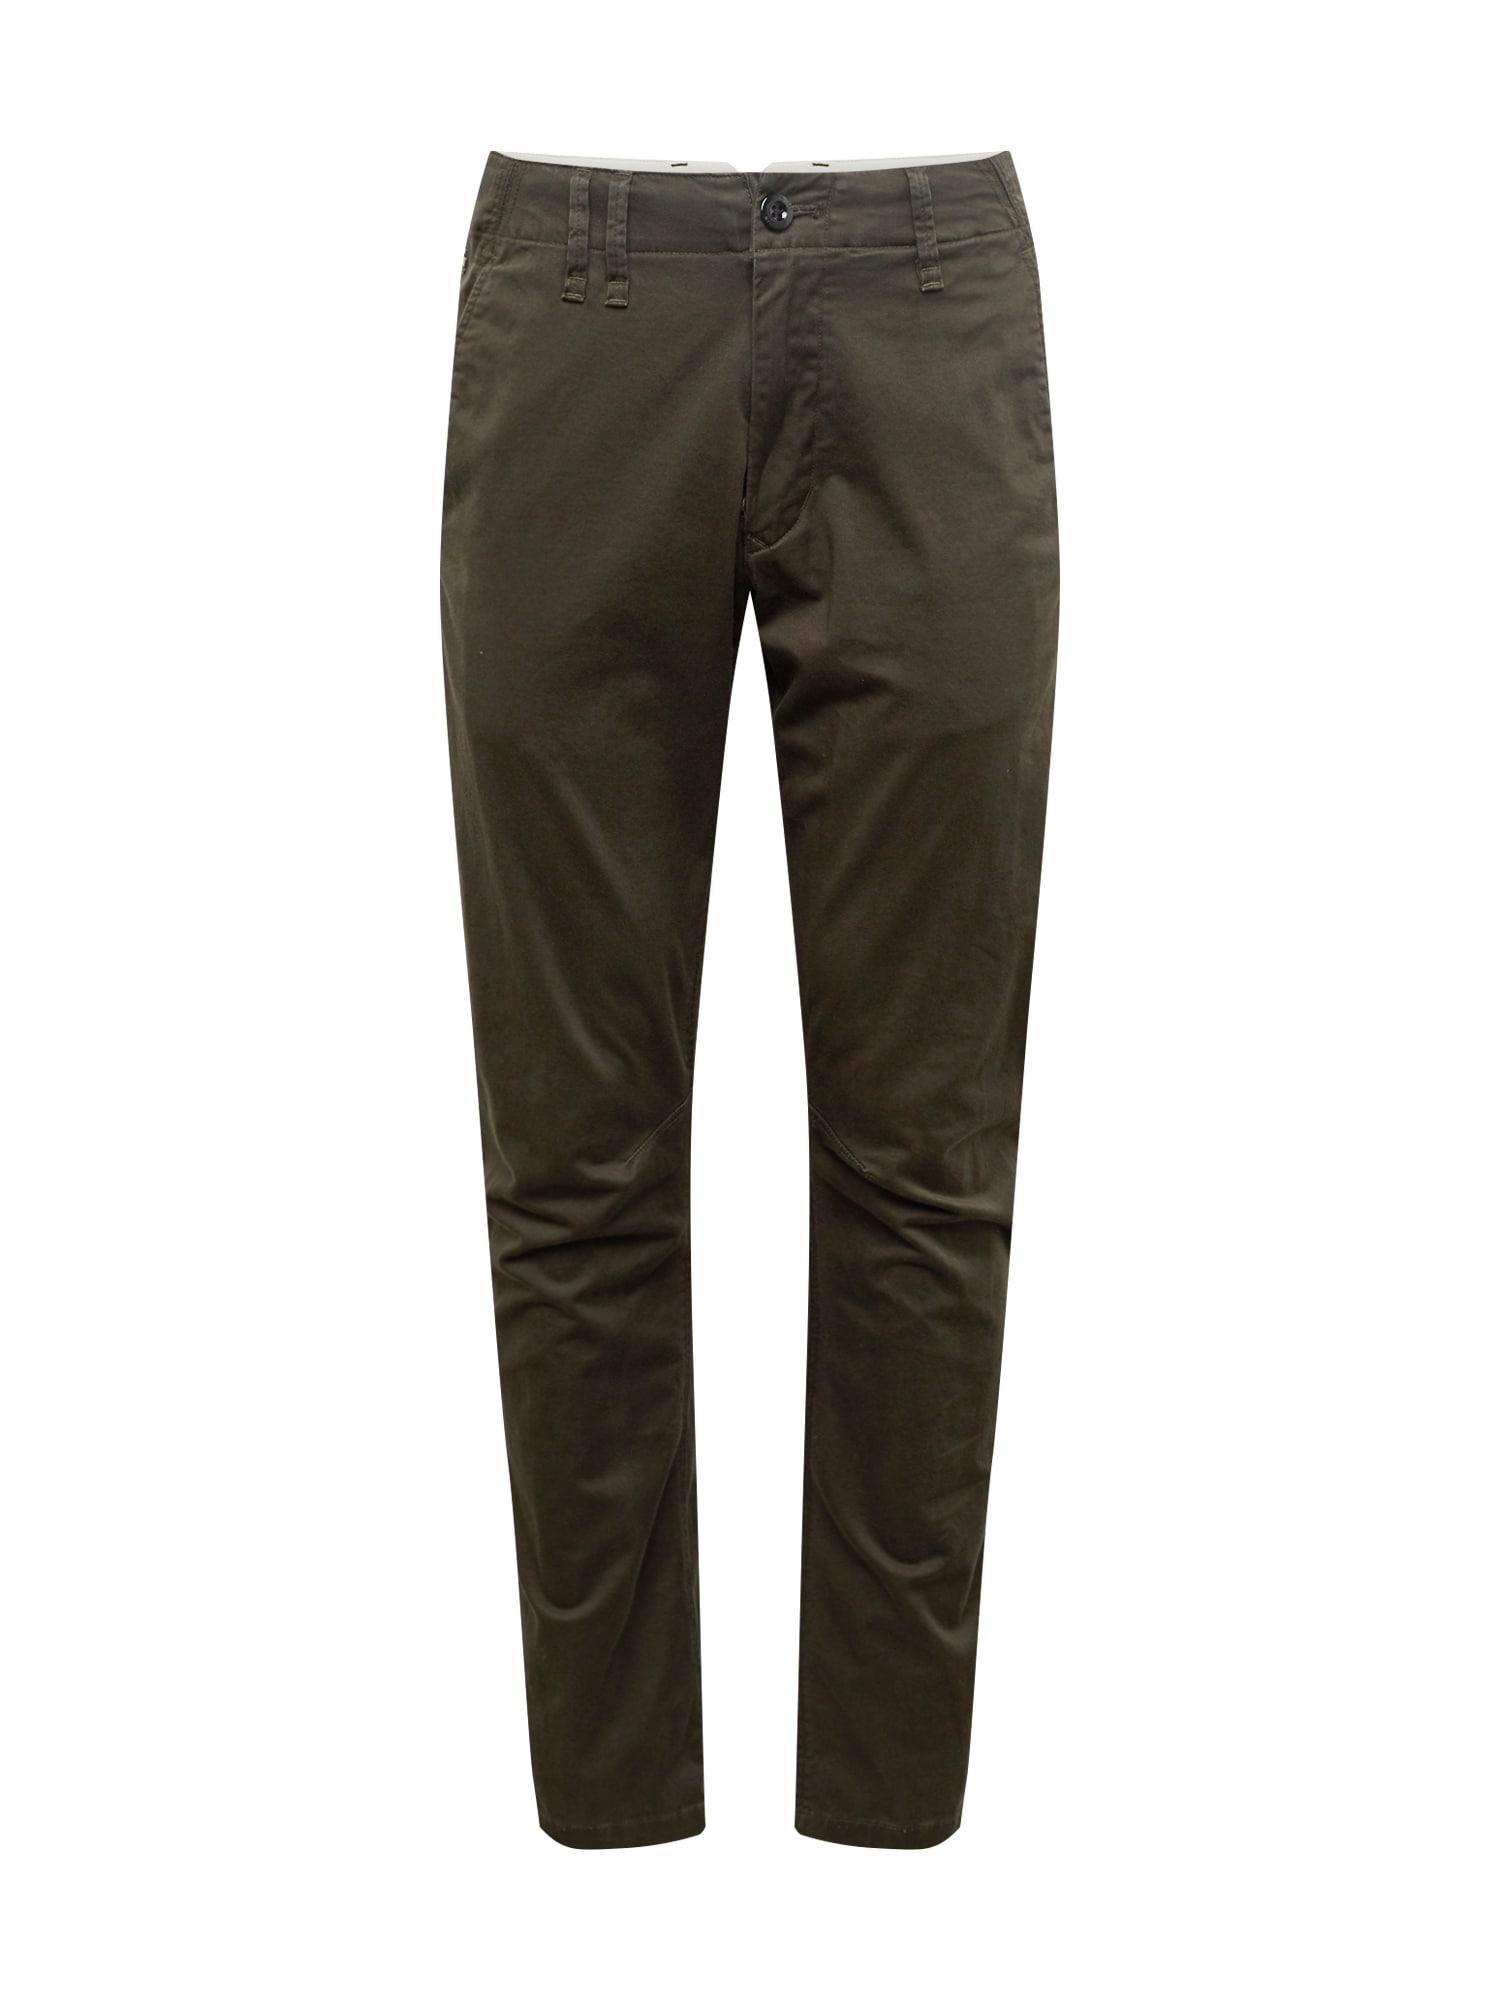 Chino kalhoty Vetar slim khaki černá G-STAR RAW